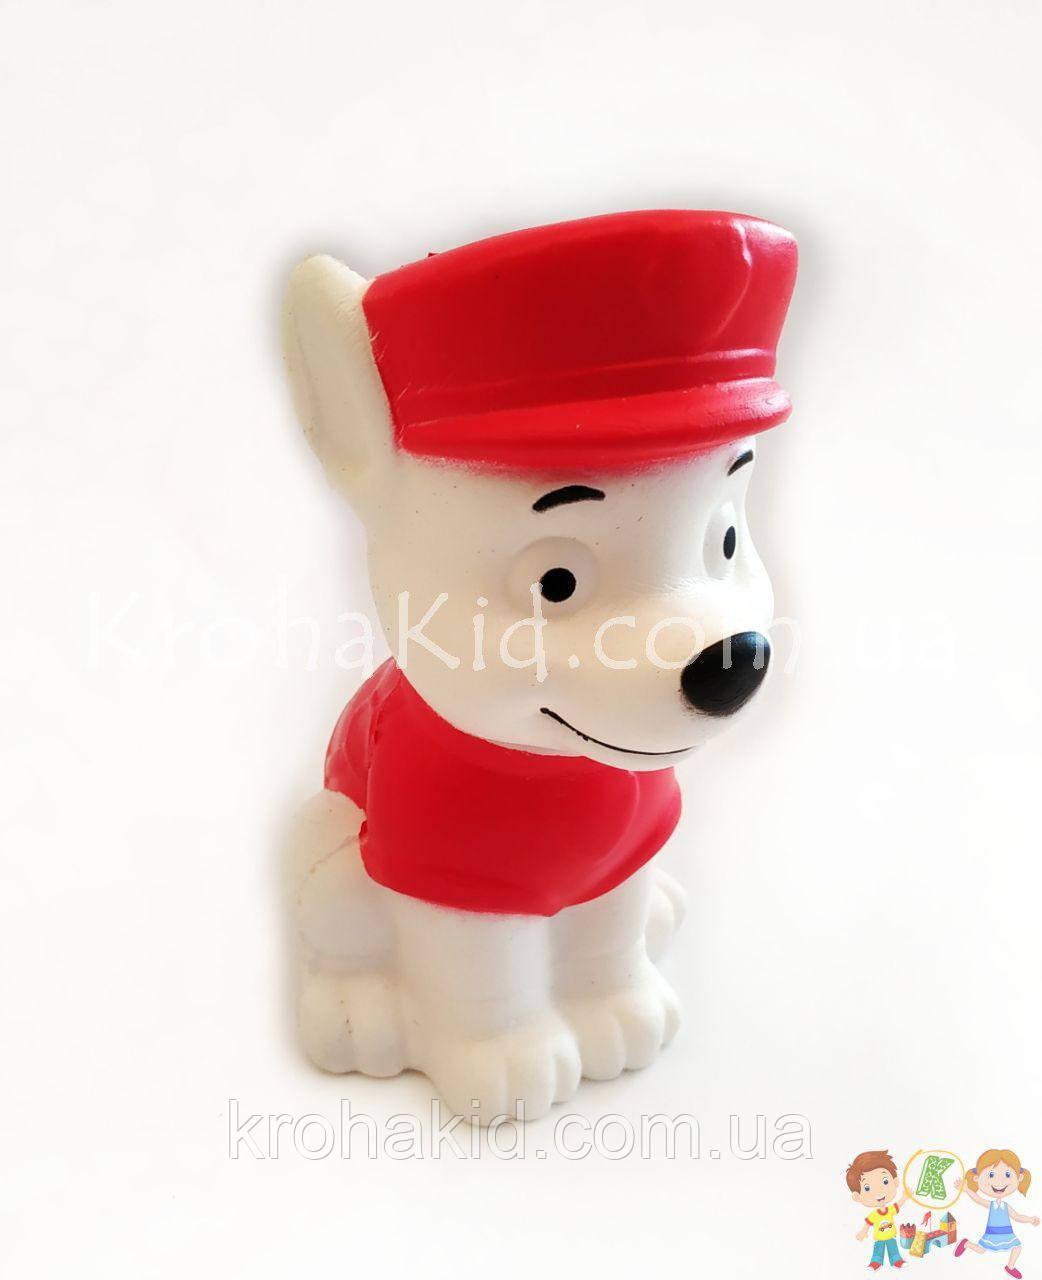 Сквиш щенячий патруль Маршал / Squishy / Сквуши / Игрушка-антистересс